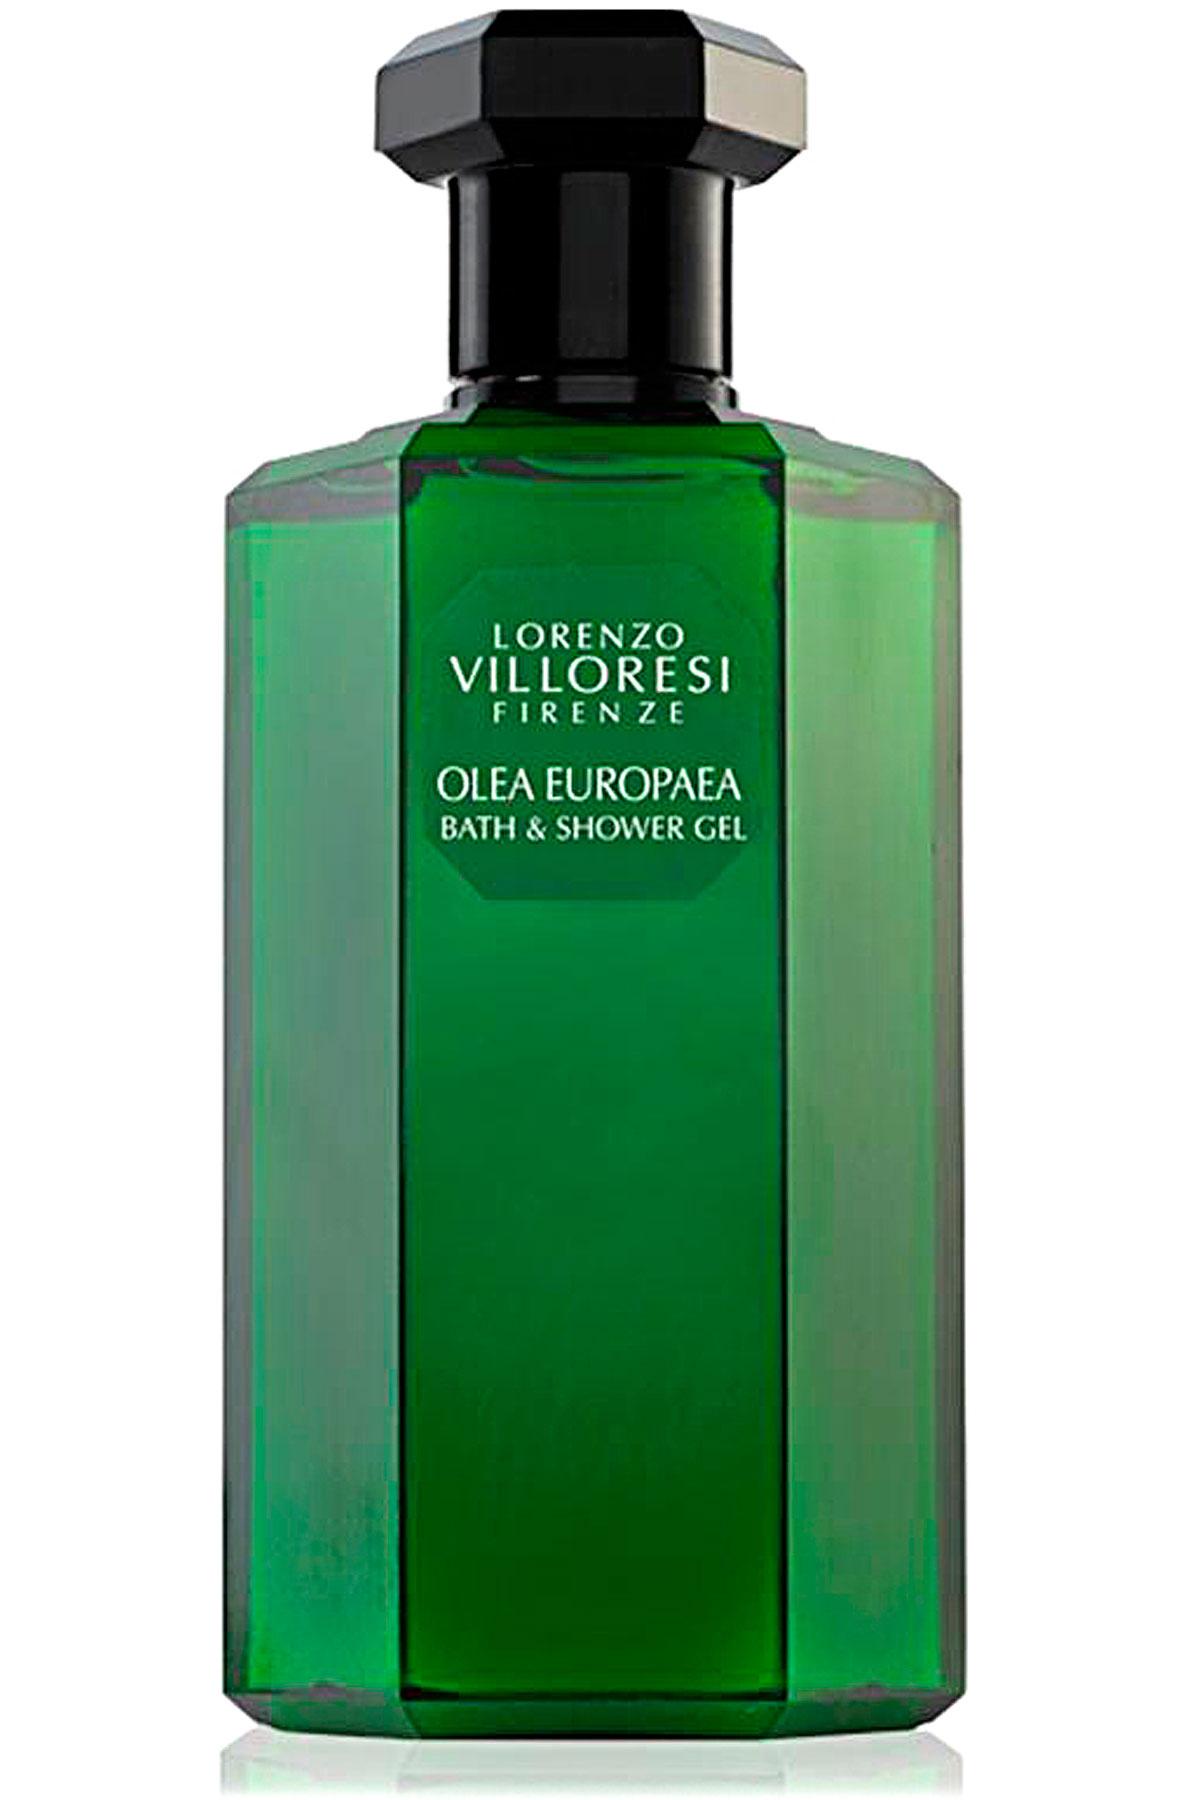 Lorenzo Villoresi Beauty for Men, Olea - Bath And Shower Gel - 250 Ml, 2019, 250 ml